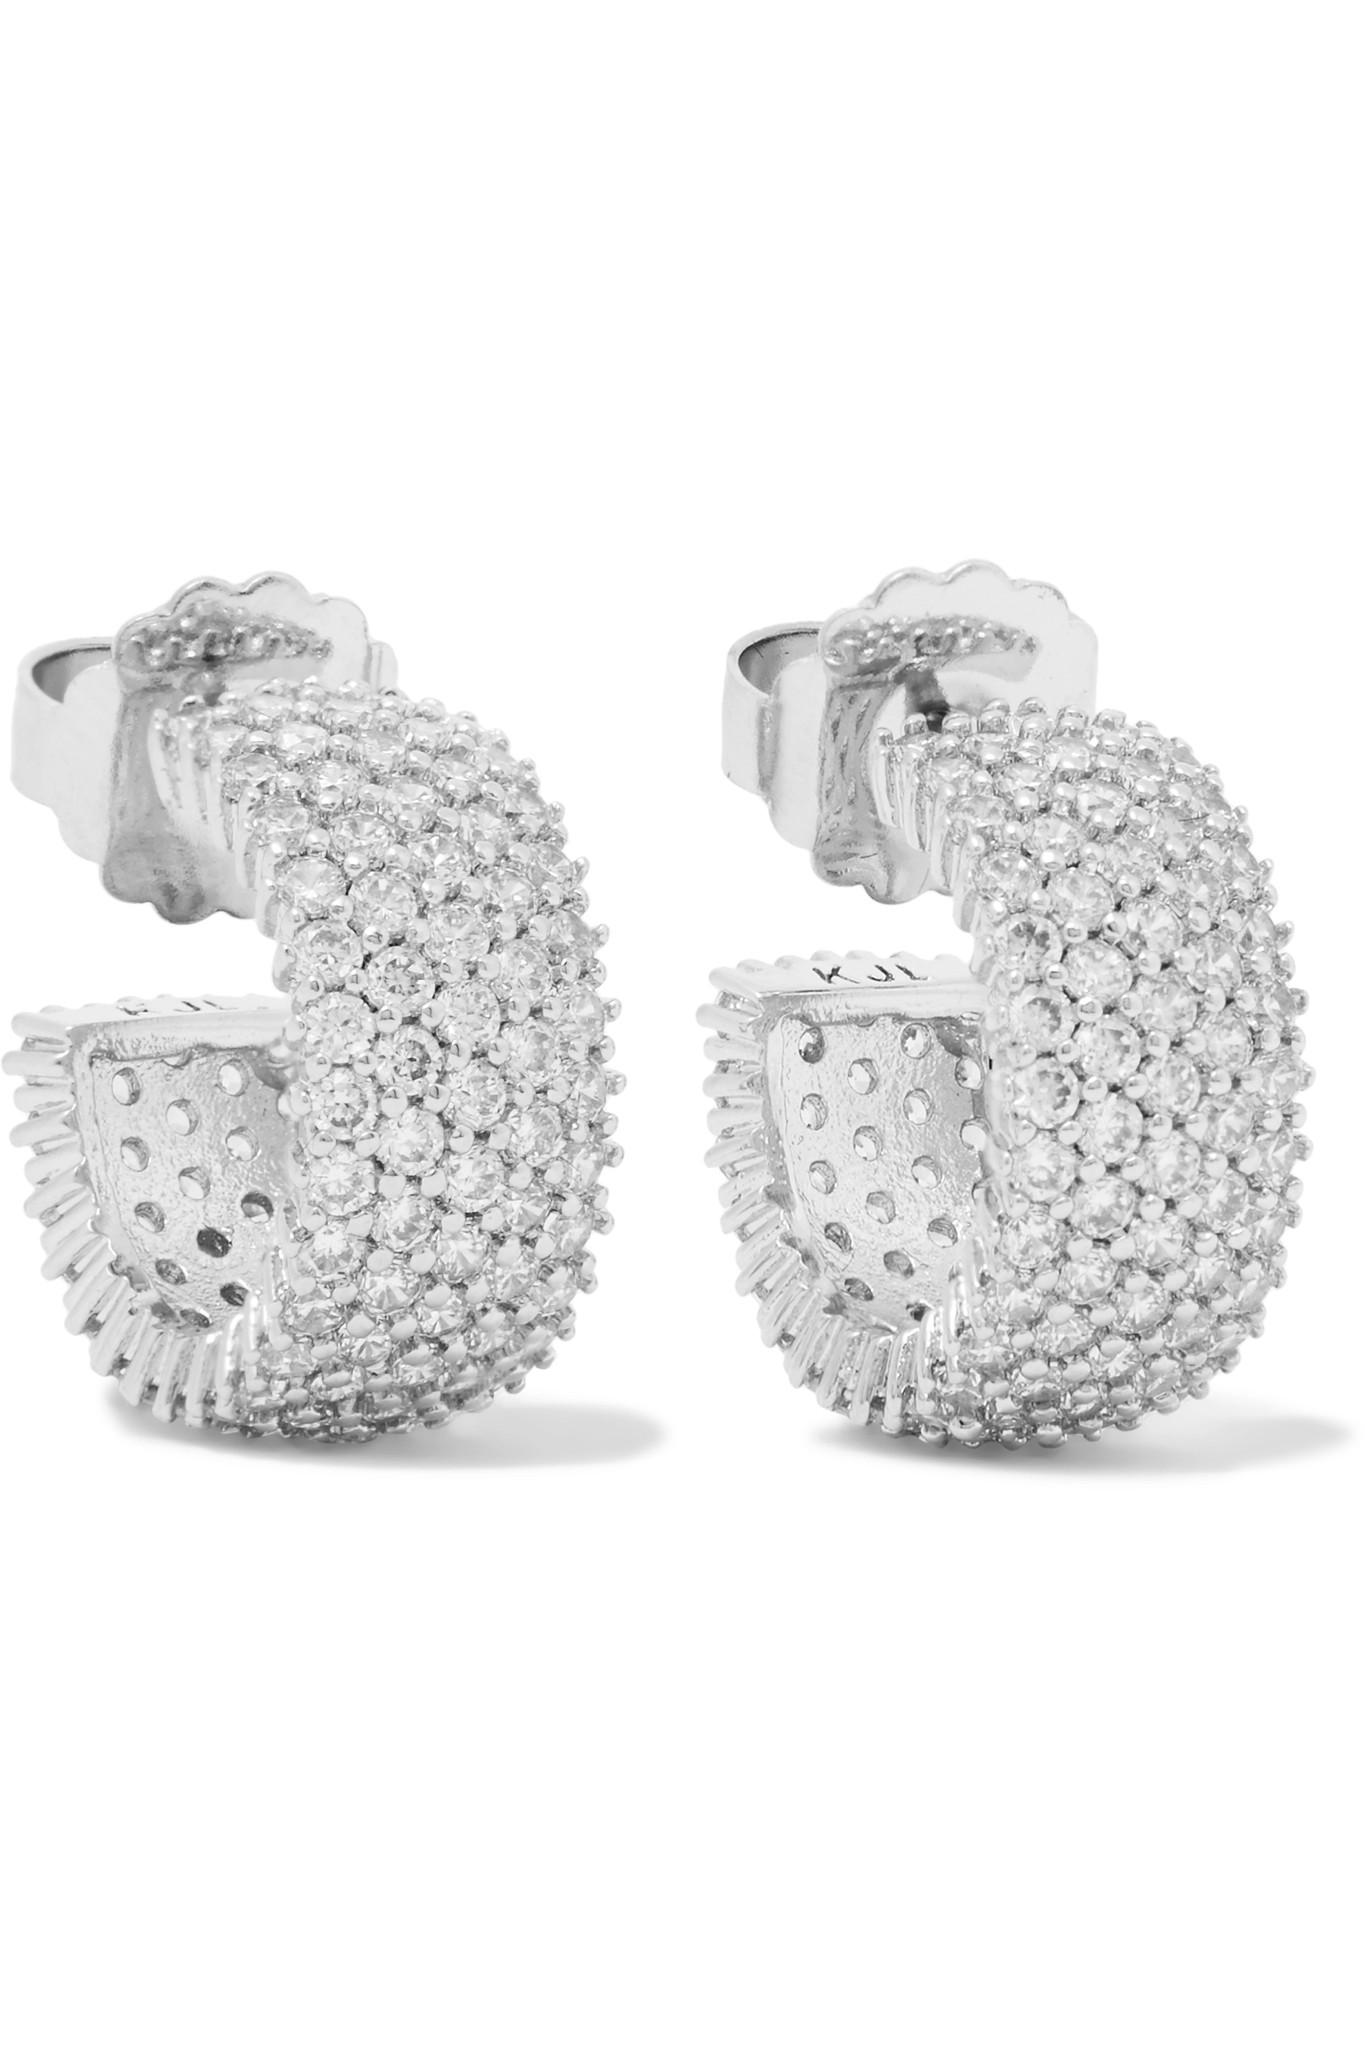 Kenneth Jay Lane Rhodium-plated Crystal Hoop Earrings - Silver 2psQNLymDU